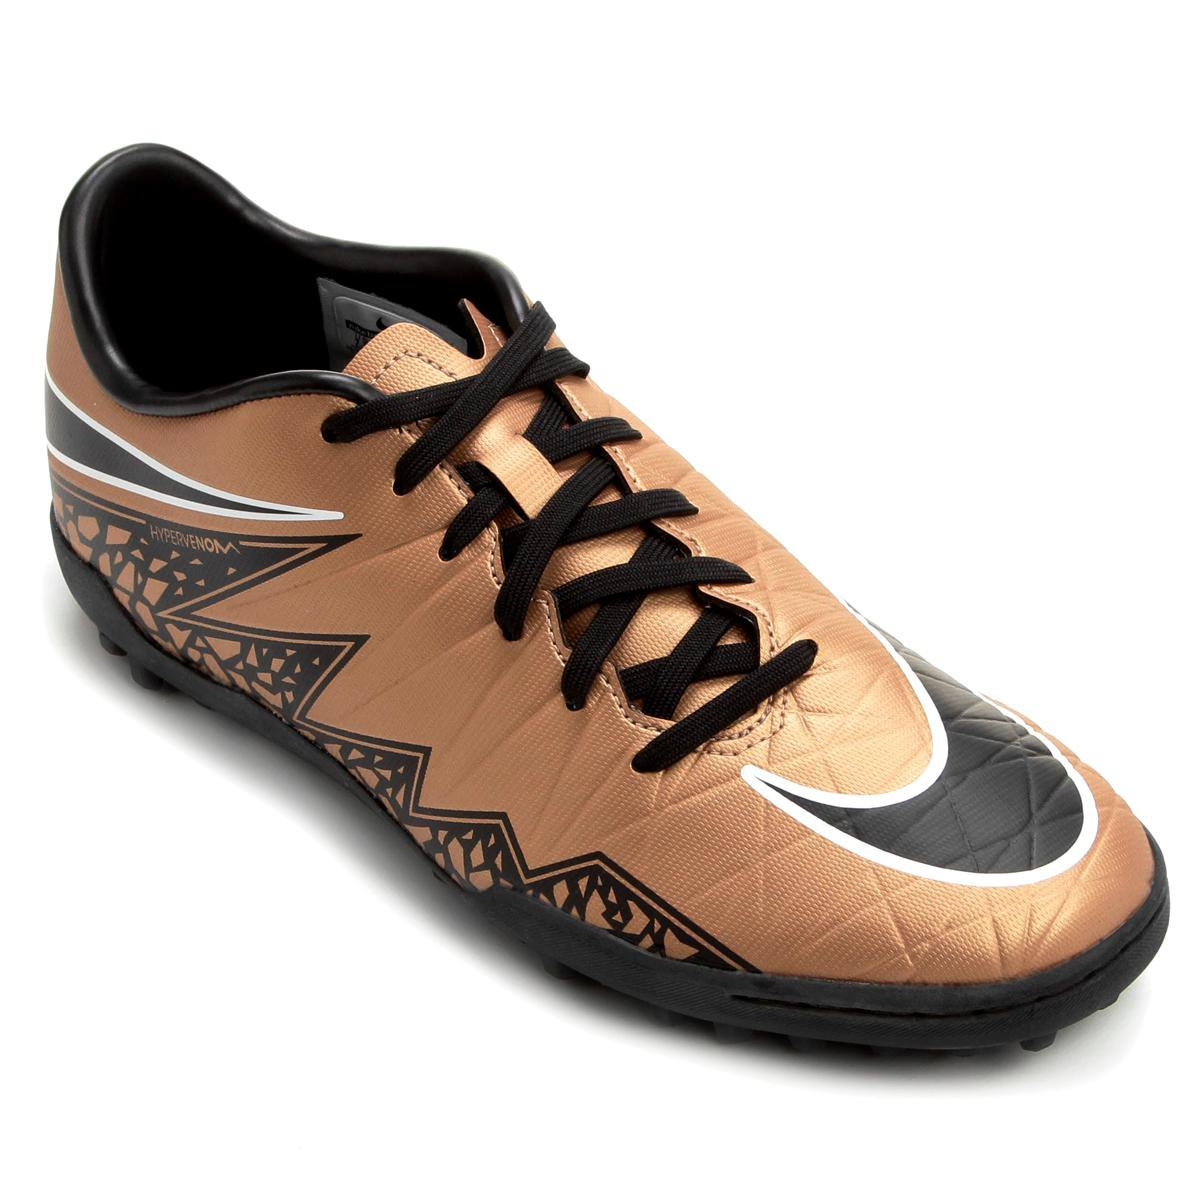 Chuteira Society Nike Hypervenom Phelon 2 TF - Compre Agora  be619ee2ab497